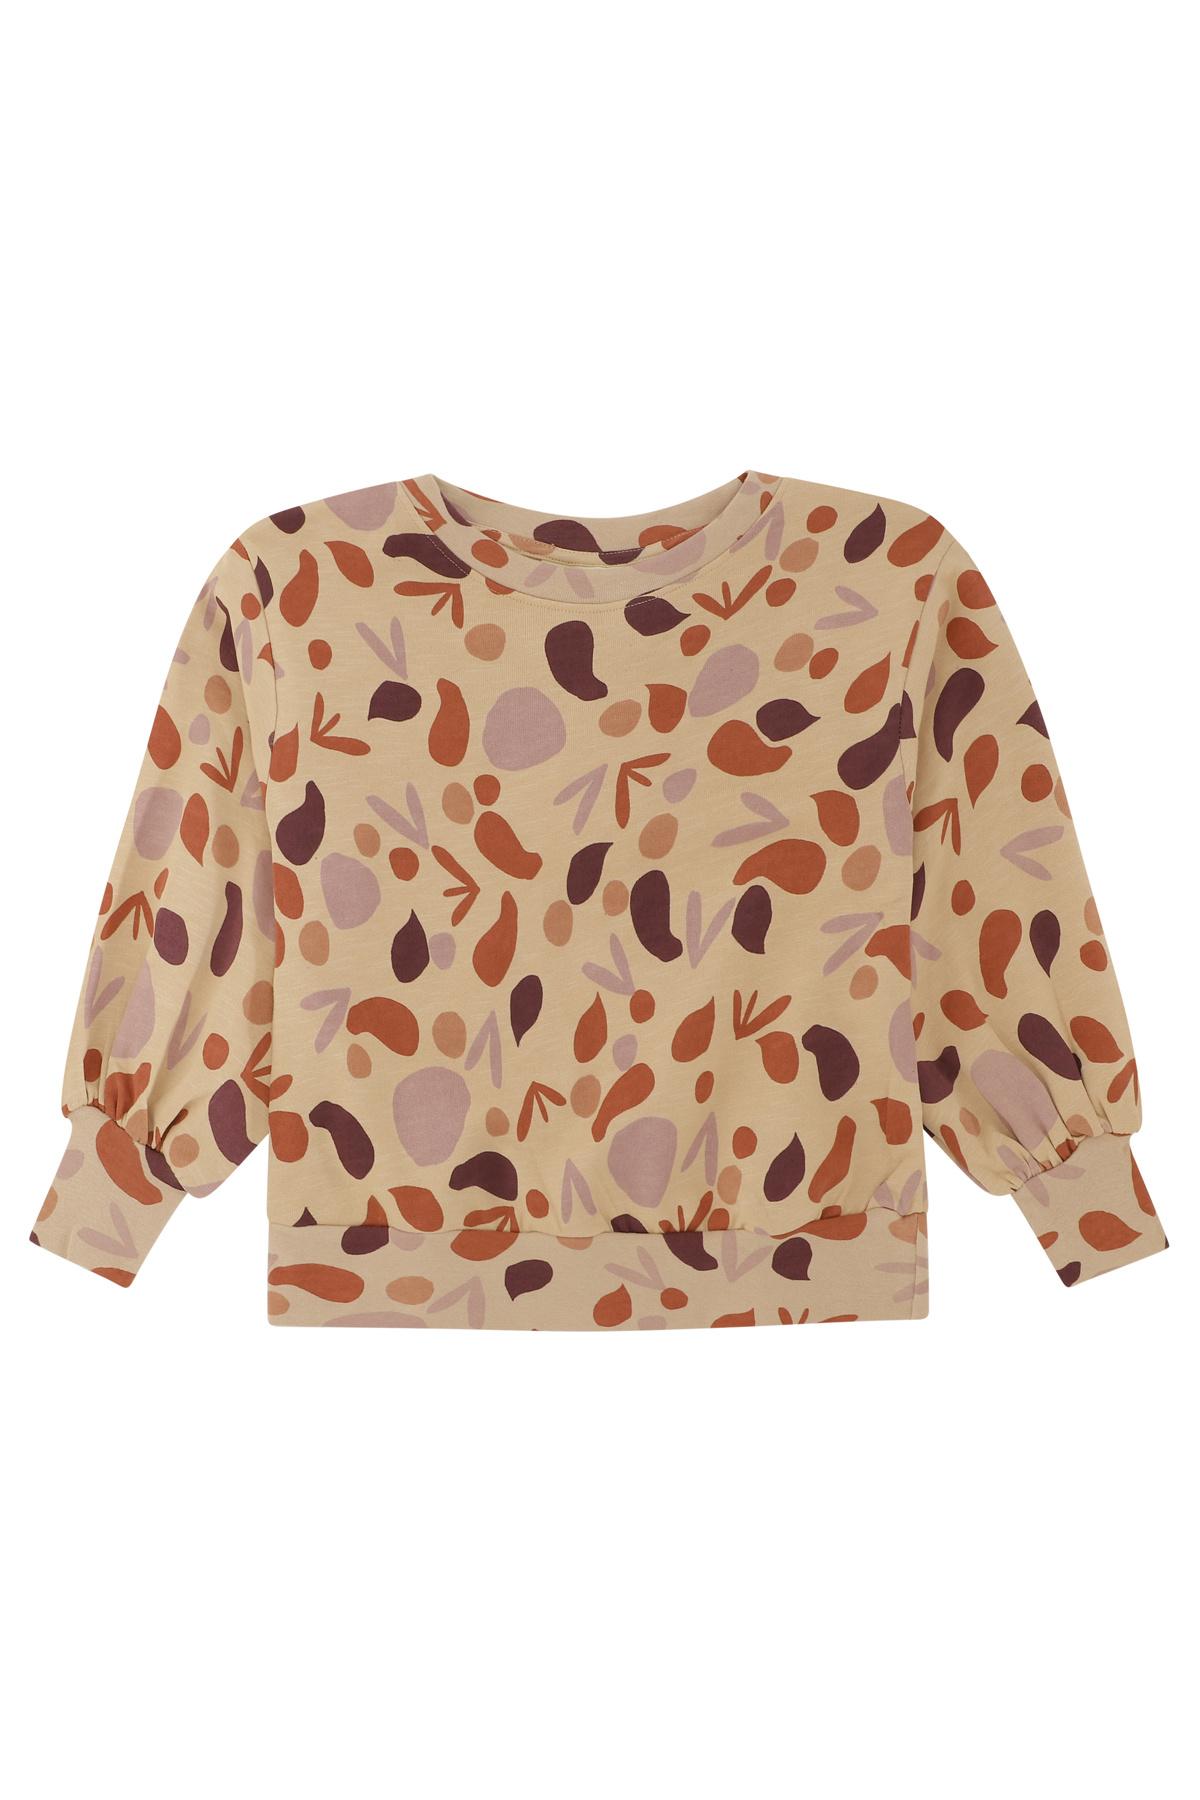 Elvira sweatshirt - Beige shapes-1